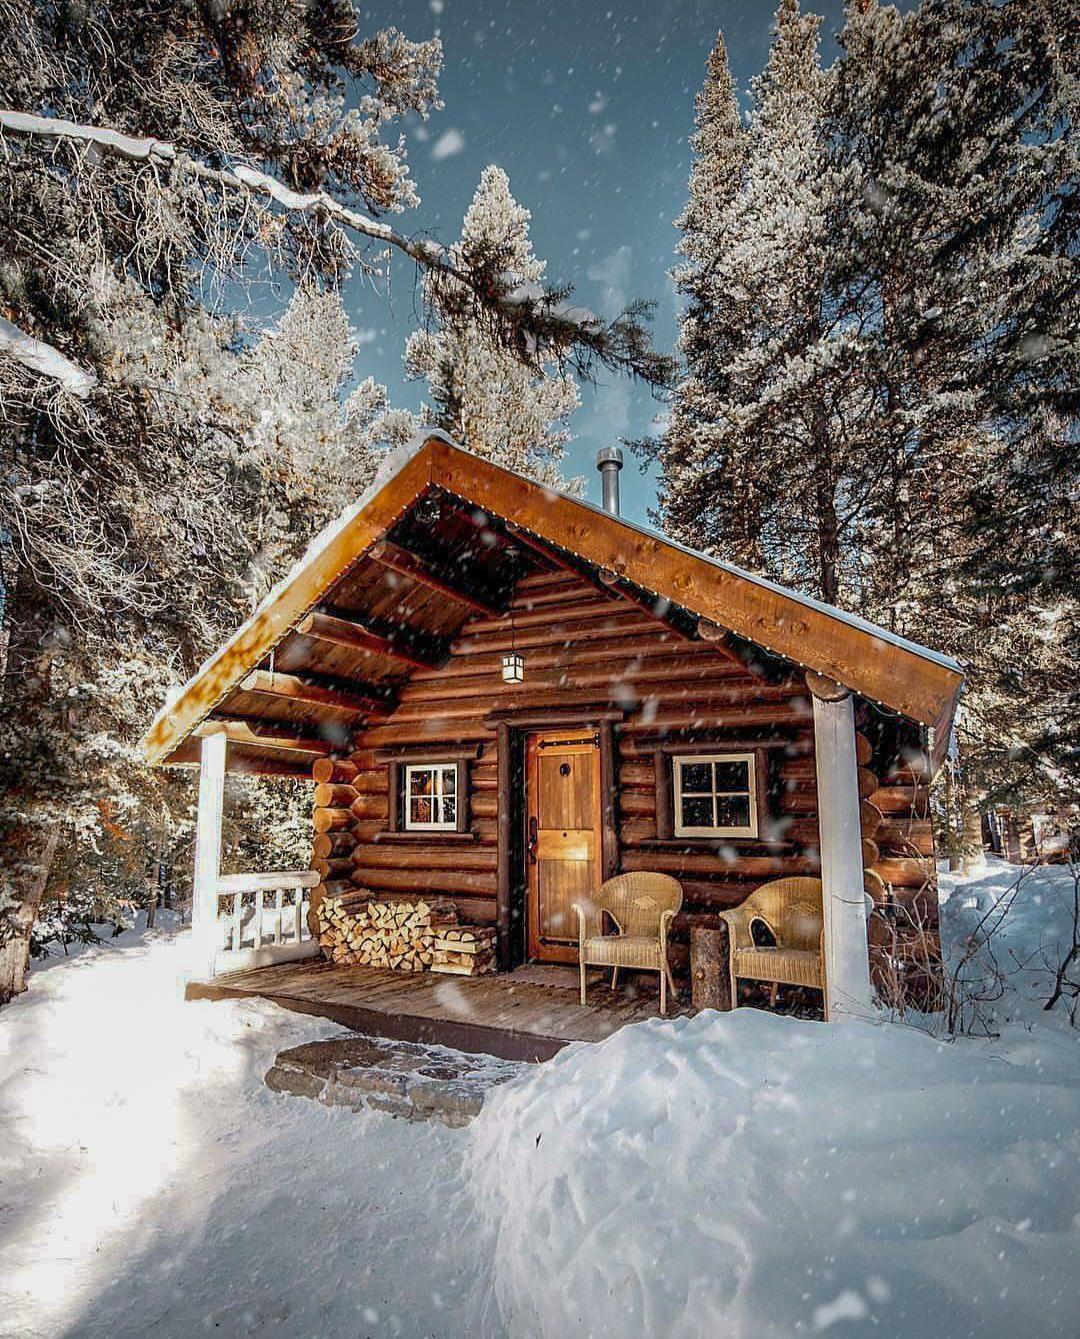 Cozy Homedecoration: Banff Canada . . #interiordesign #cozyplace #rustic